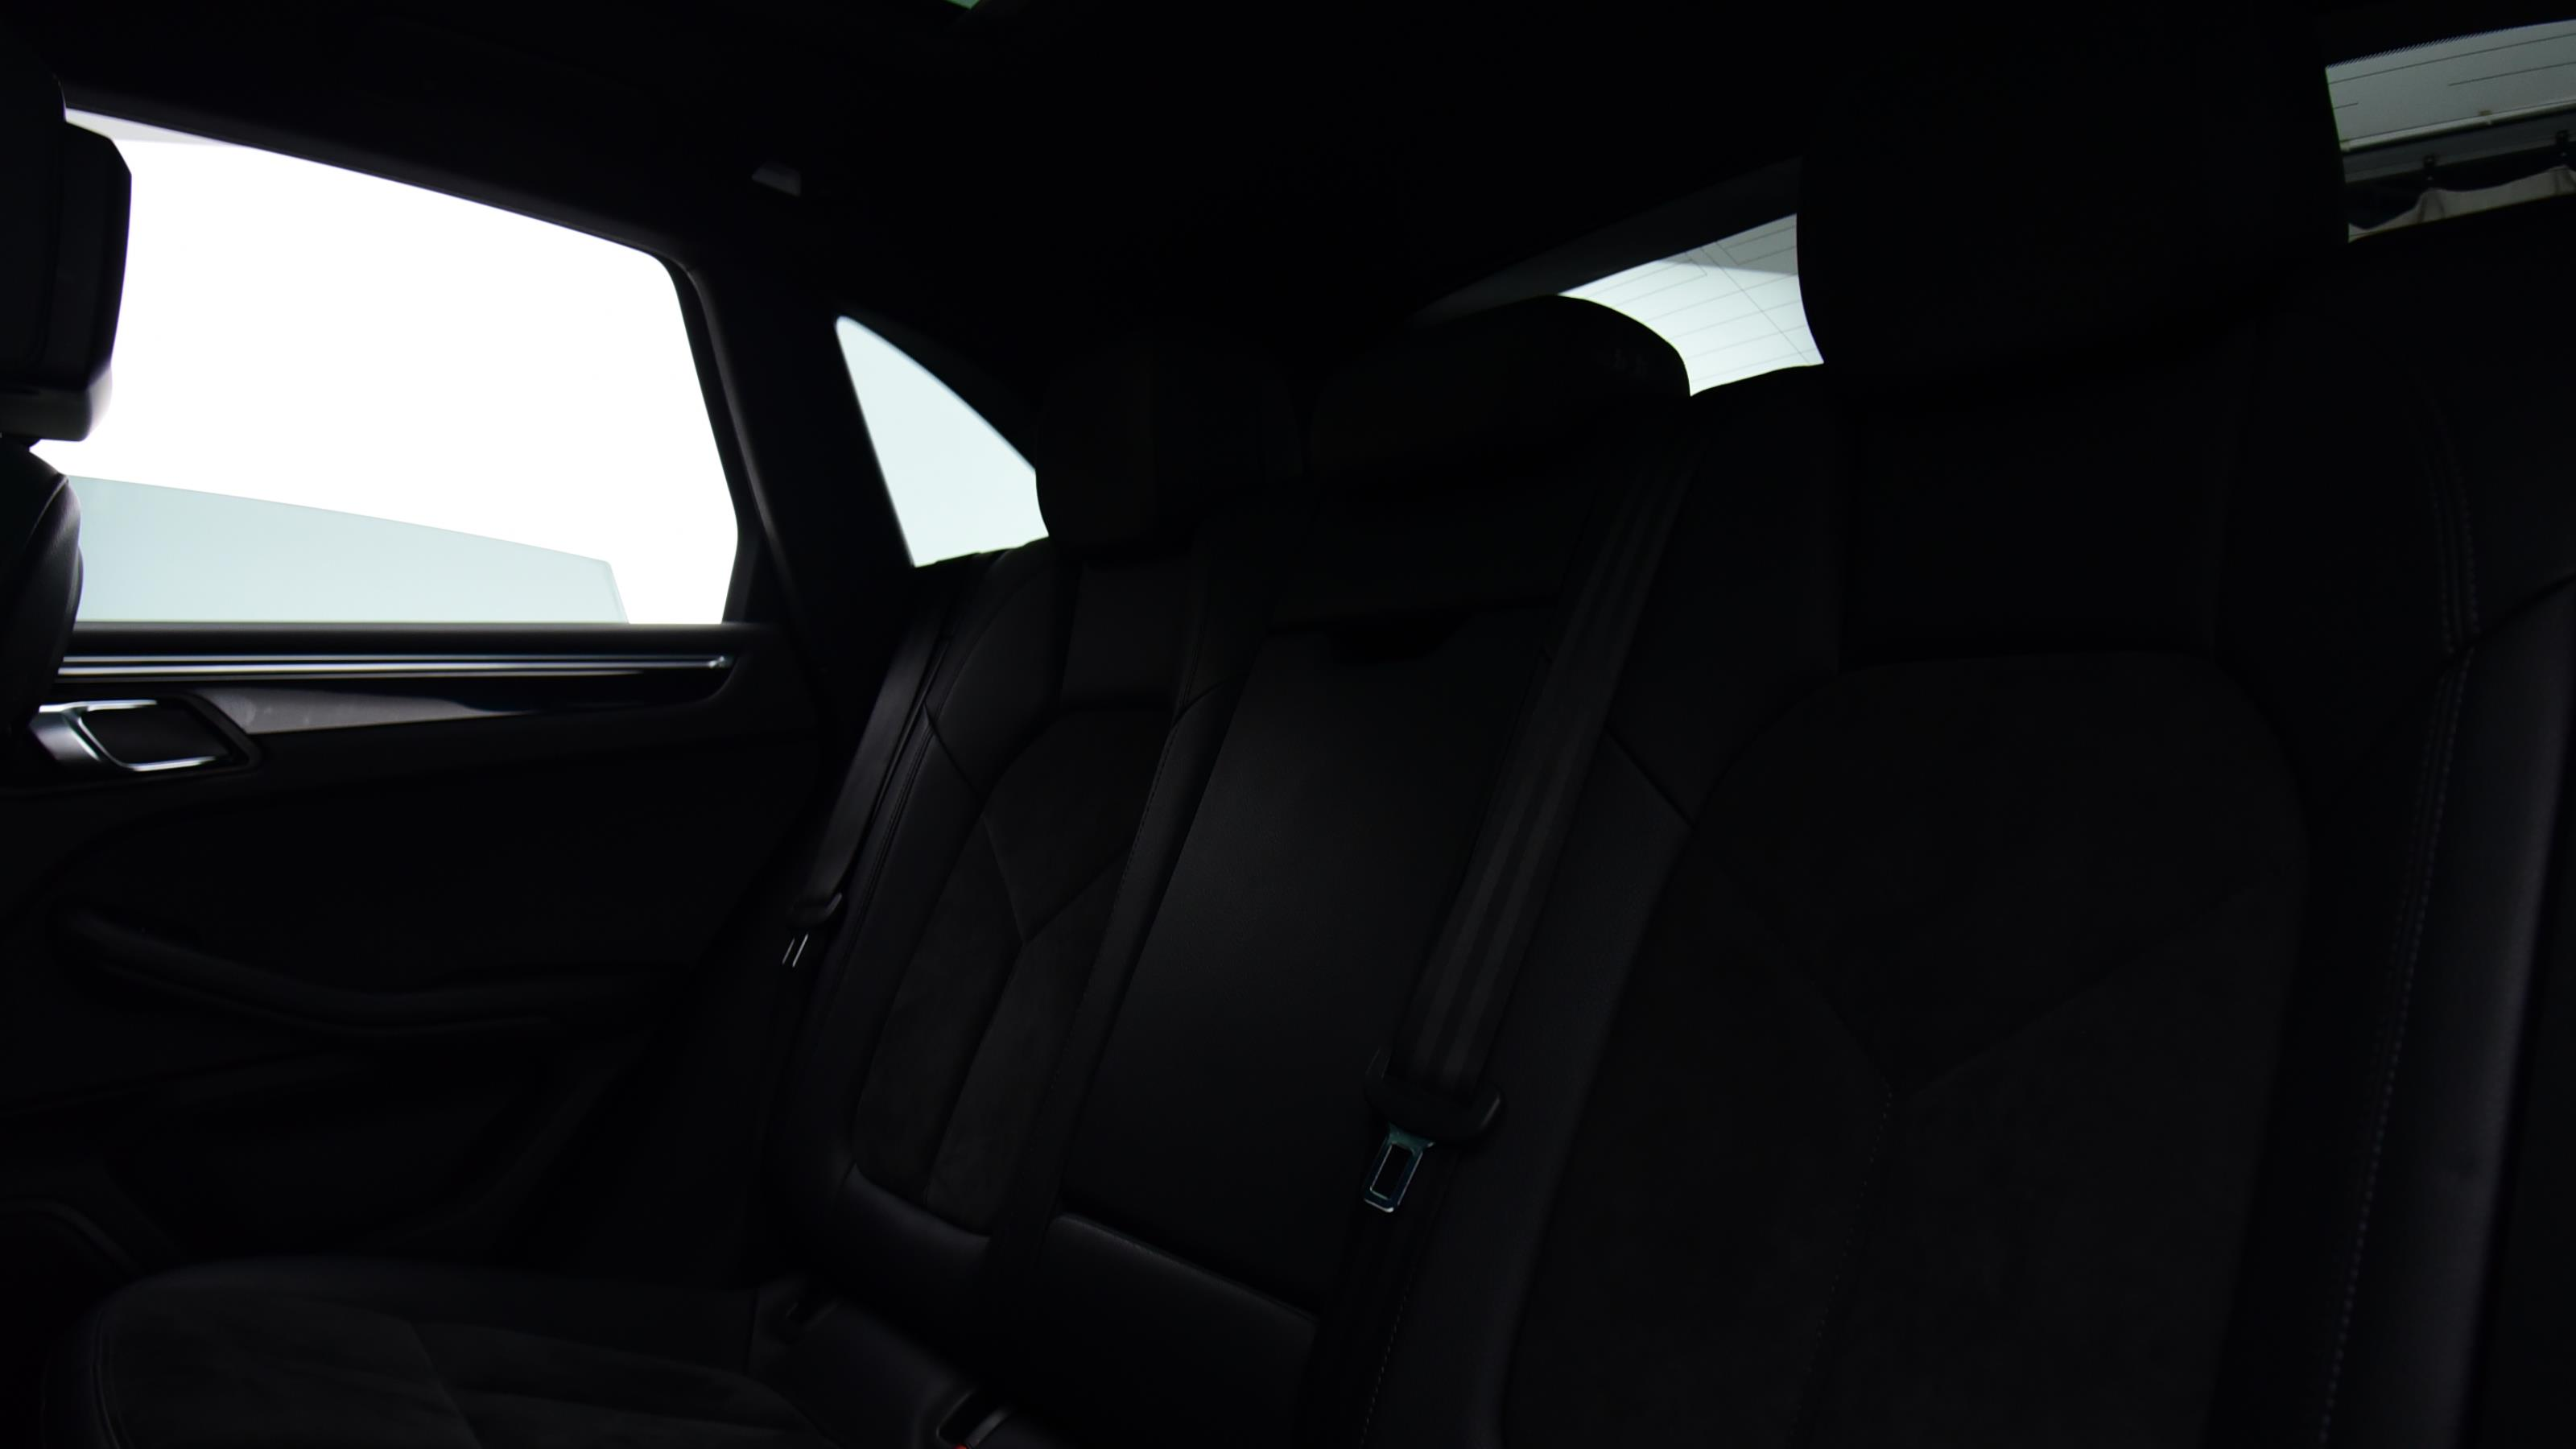 Used 2015 Porsche MACAN S Diesel 5dr PDK BLACK at Saxton4x4